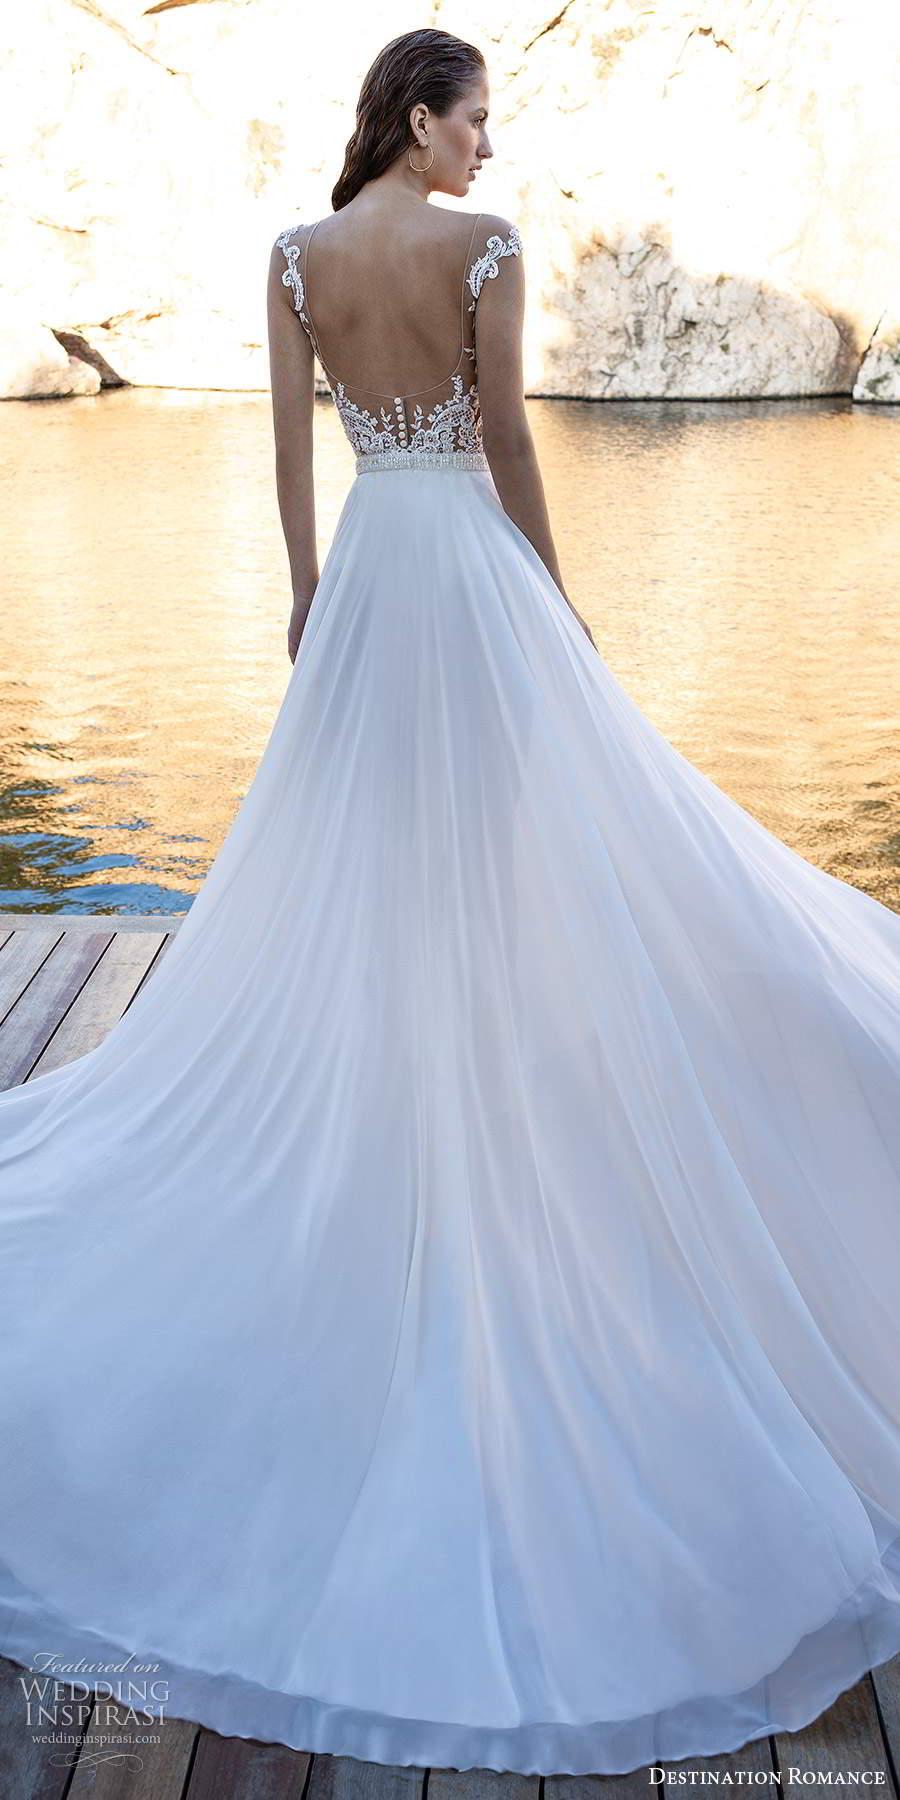 destination romance 2020 bridal cap sleeves illusion bateau sweetheart neckline embellished bodice bodysuit wedding dress a line overskirt (15) bv